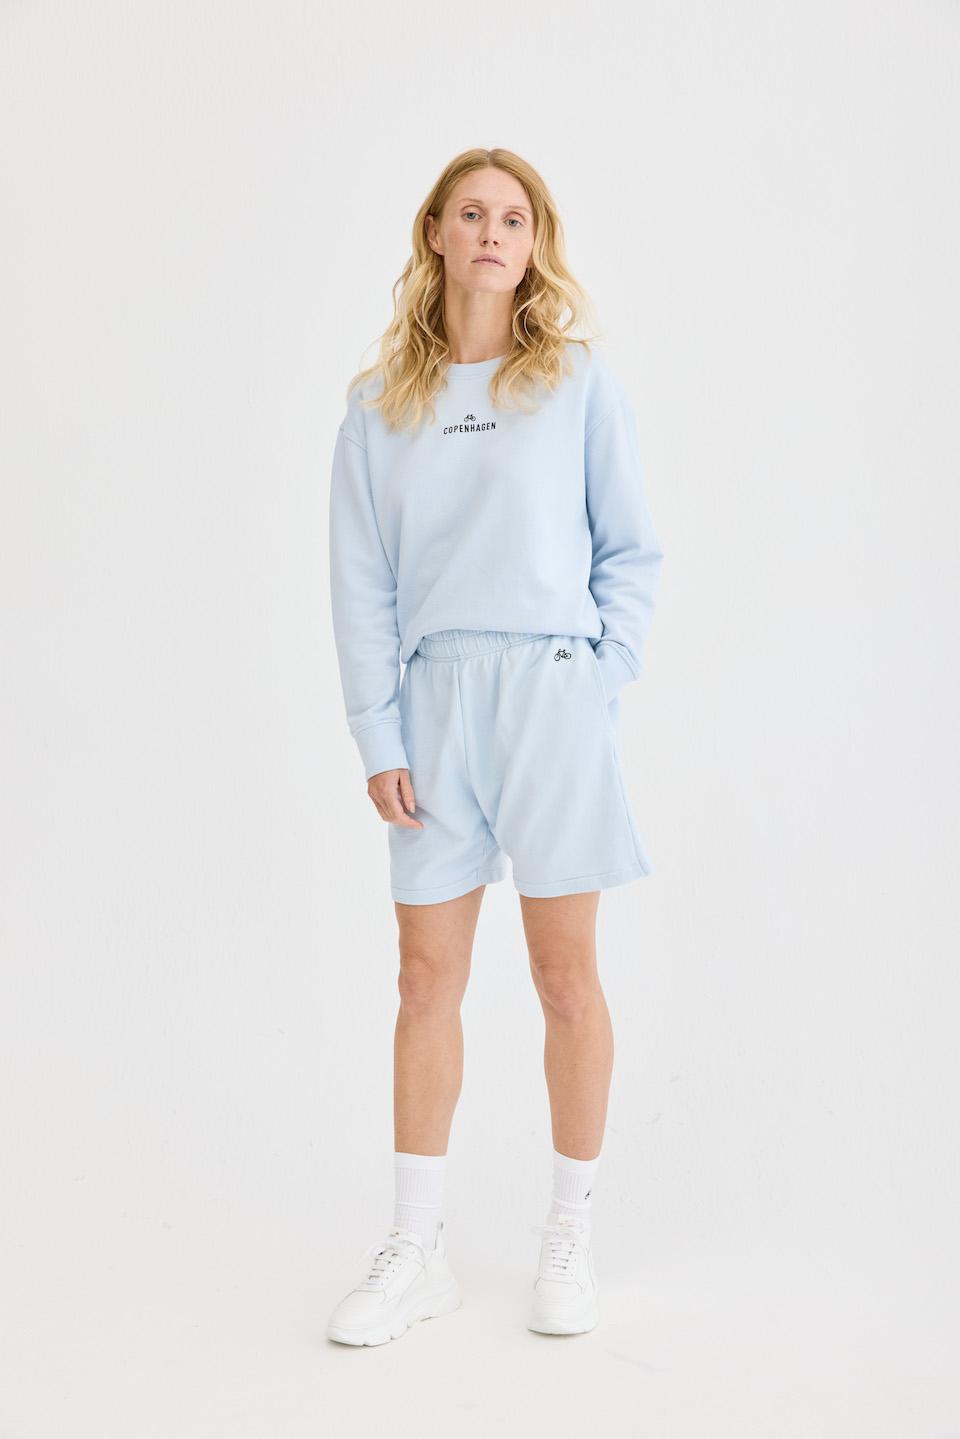 CPH Shorts 1 org. cotton light blue - alternative 1